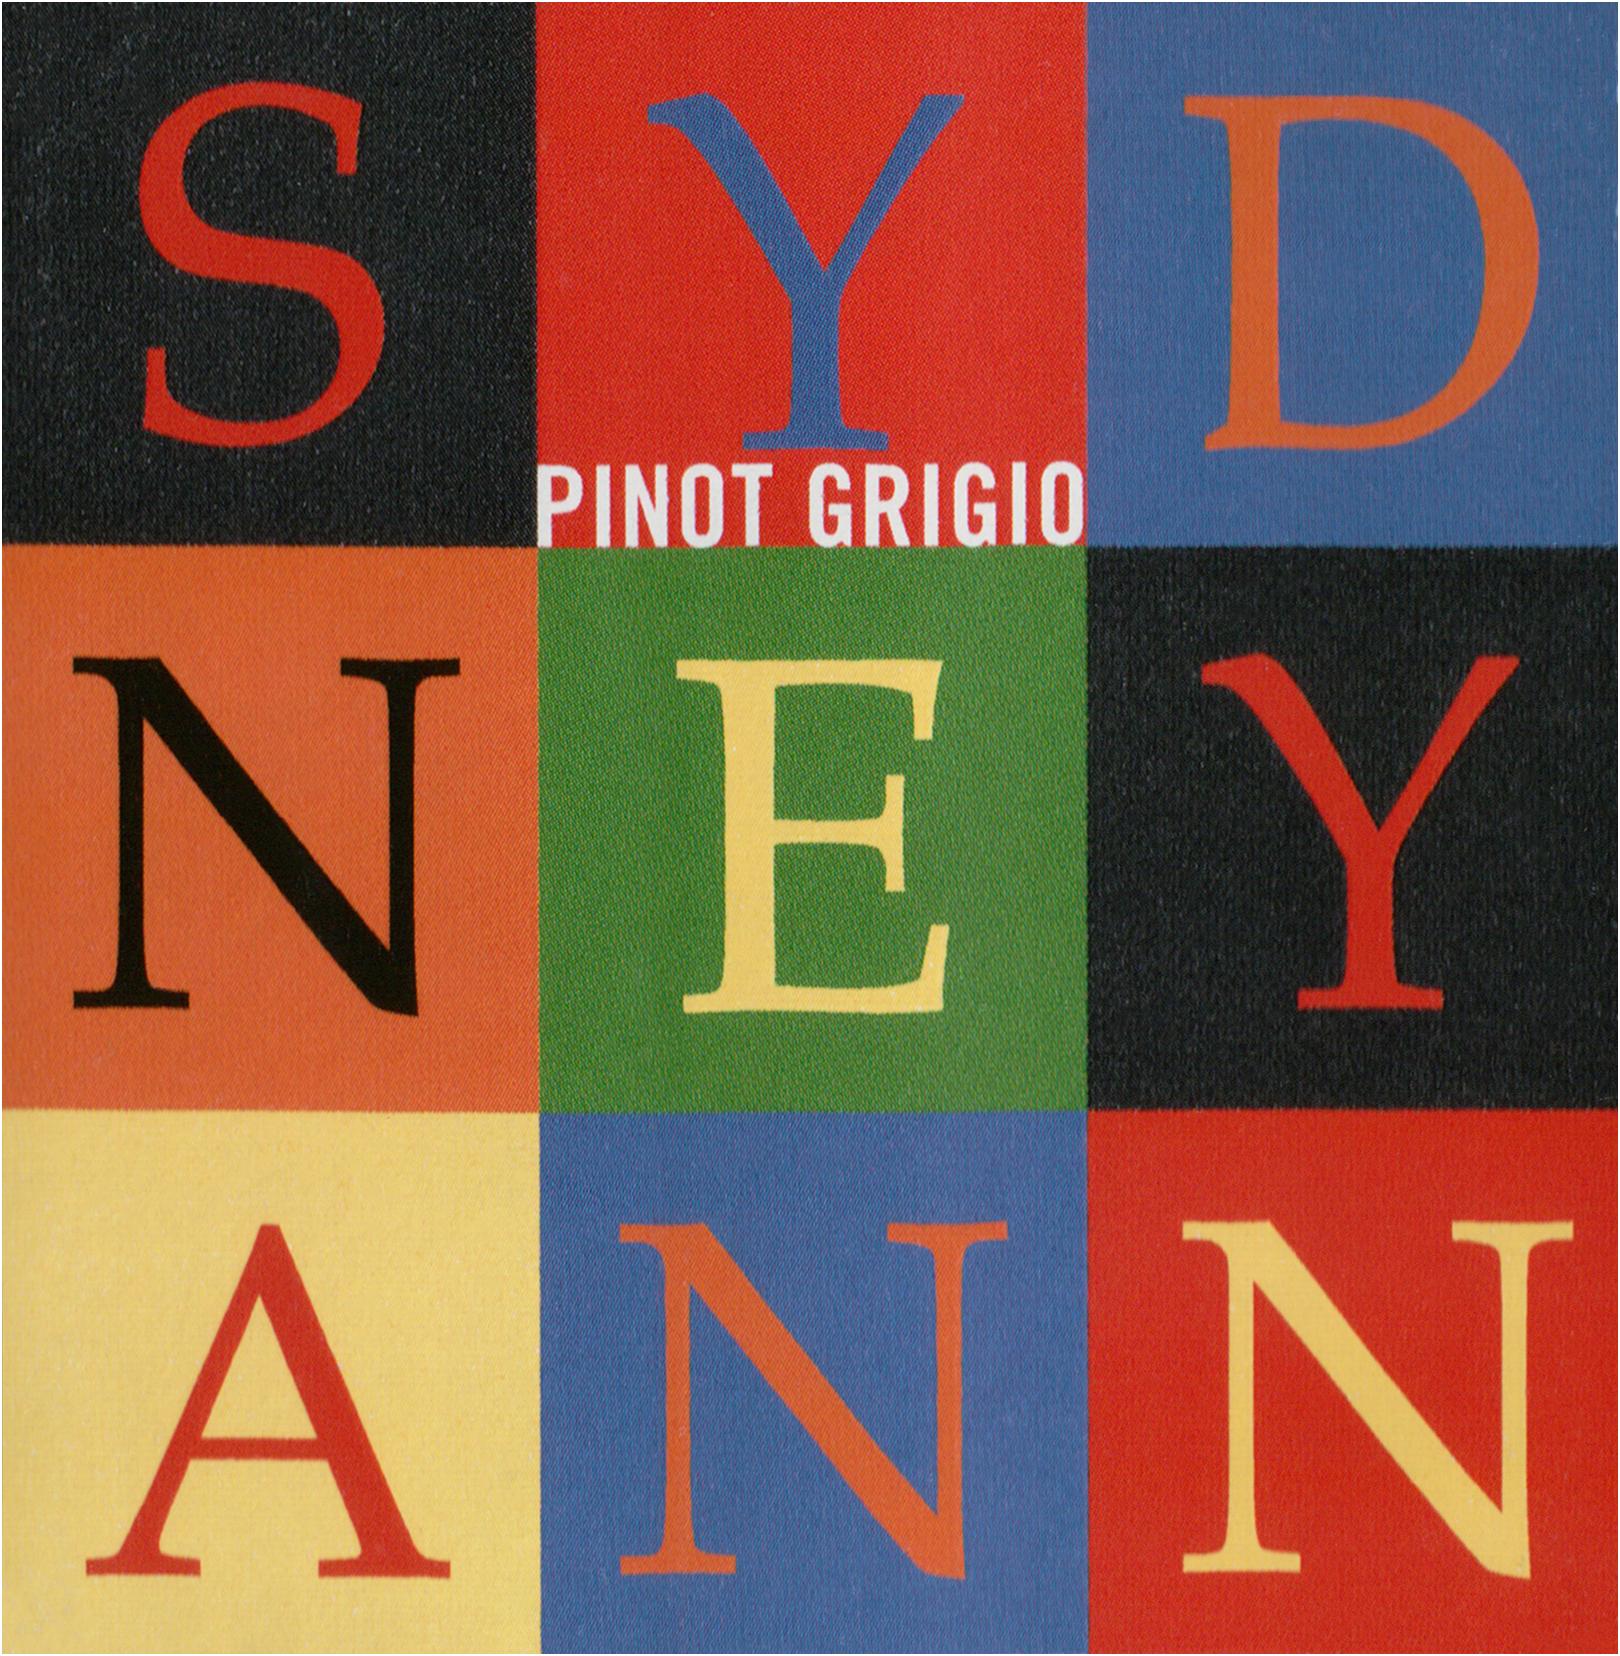 Sydney Ann Pinot Grigio 2018